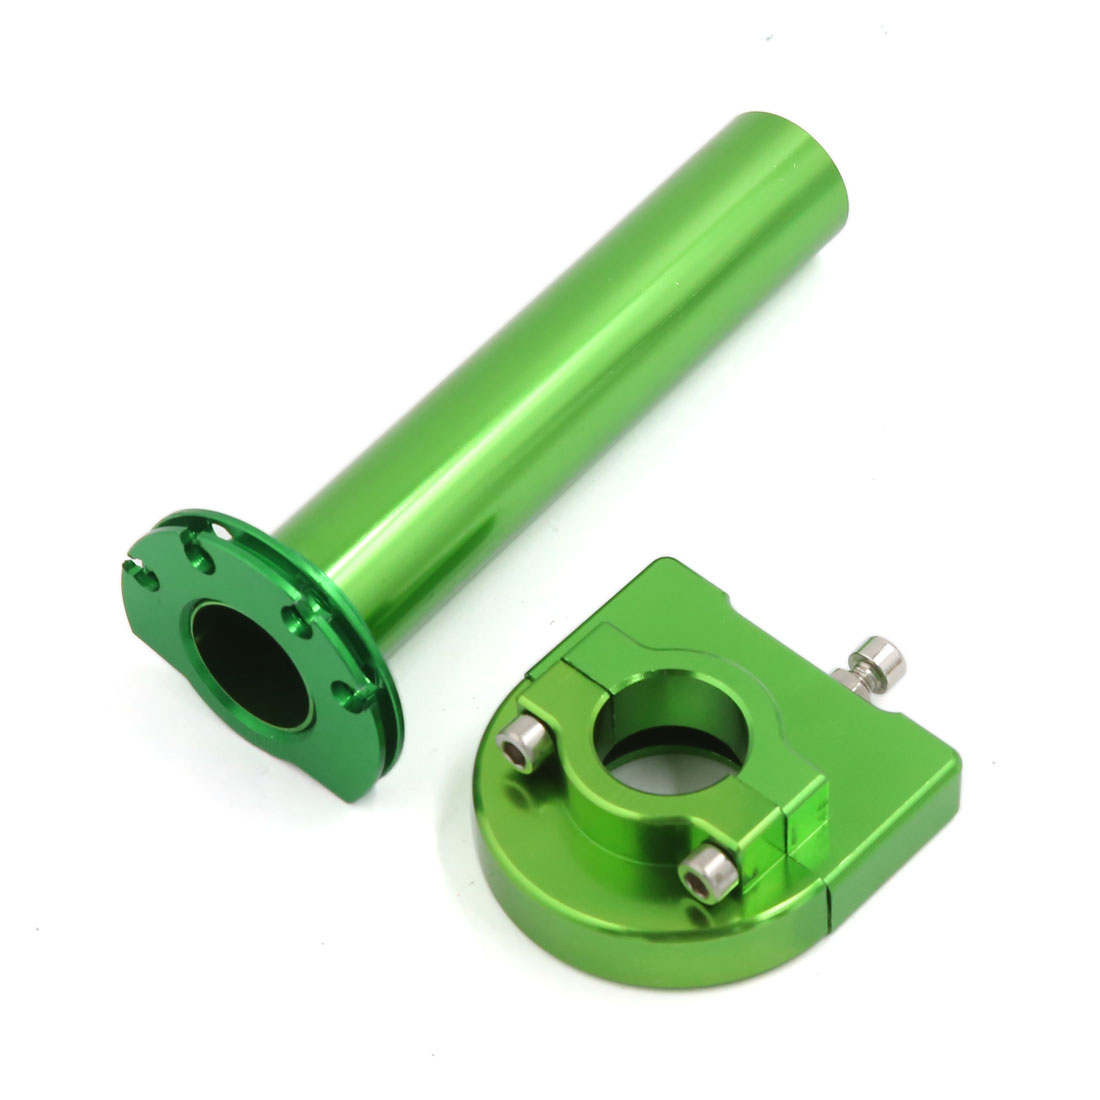 Green Aluminum Alloy Motorcycle 22mm Accelerator Handlebar Handgrips Universal